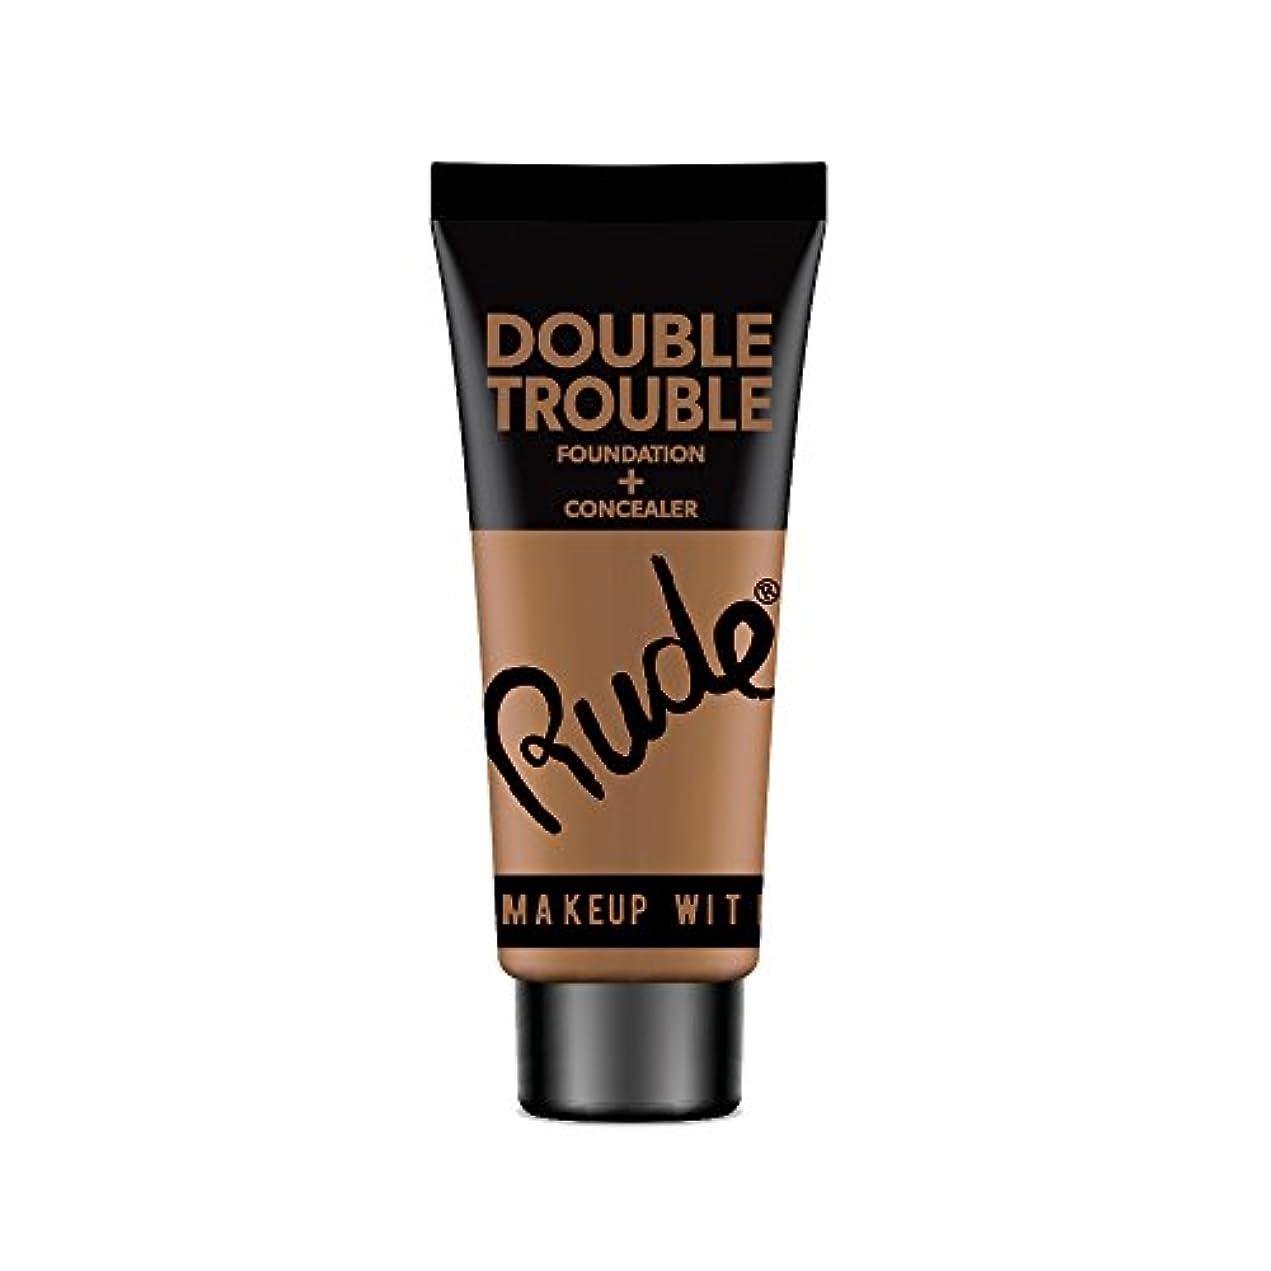 (3 Pack) RUDE Double Trouble Foundation + Concealer - Espresso (並行輸入品)